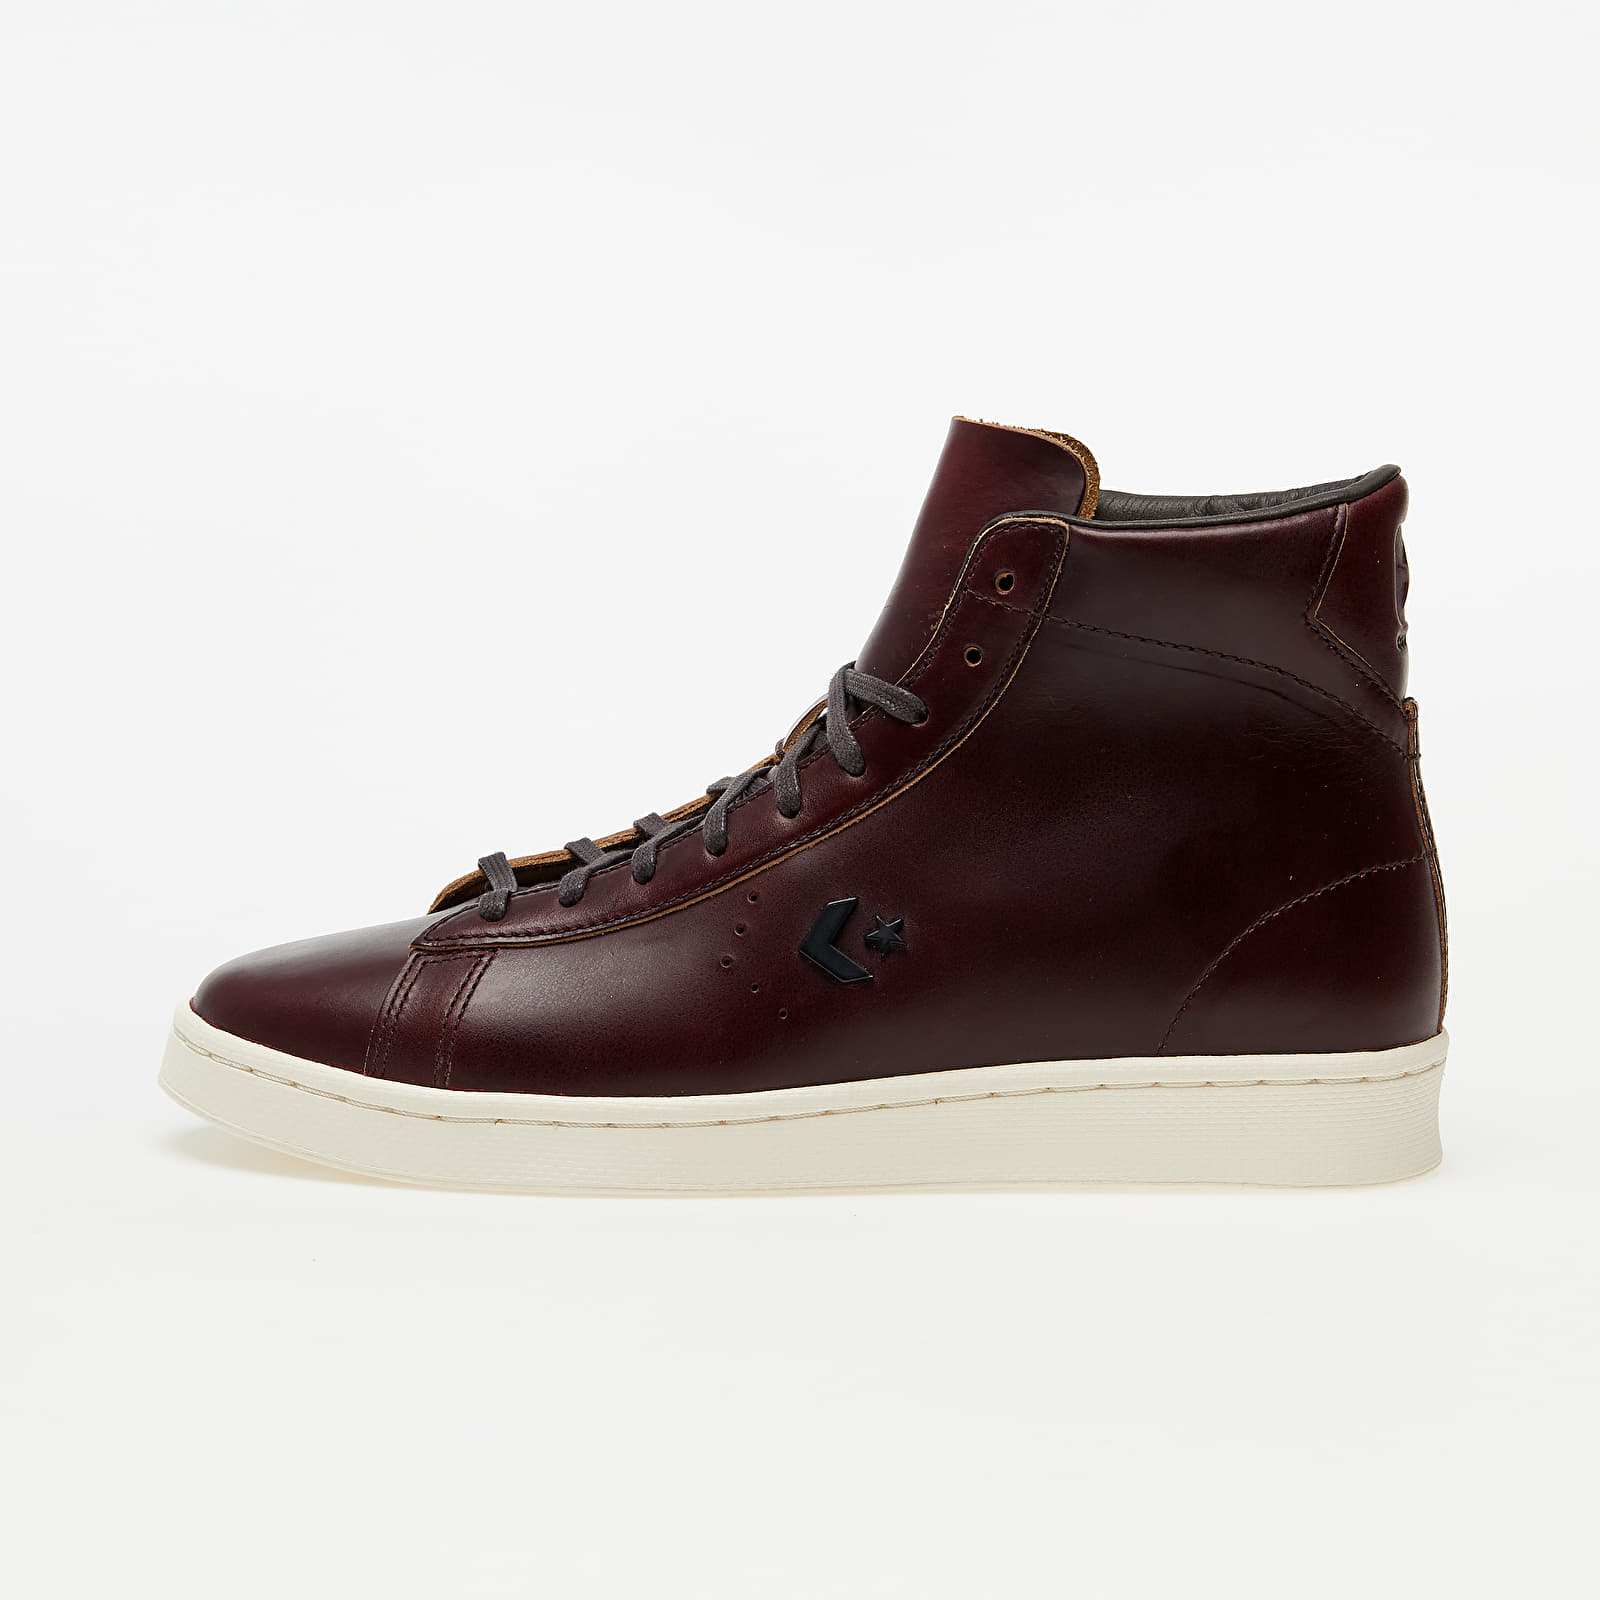 Converse Pro Leather Ganache/ Egret/ Black 168750C